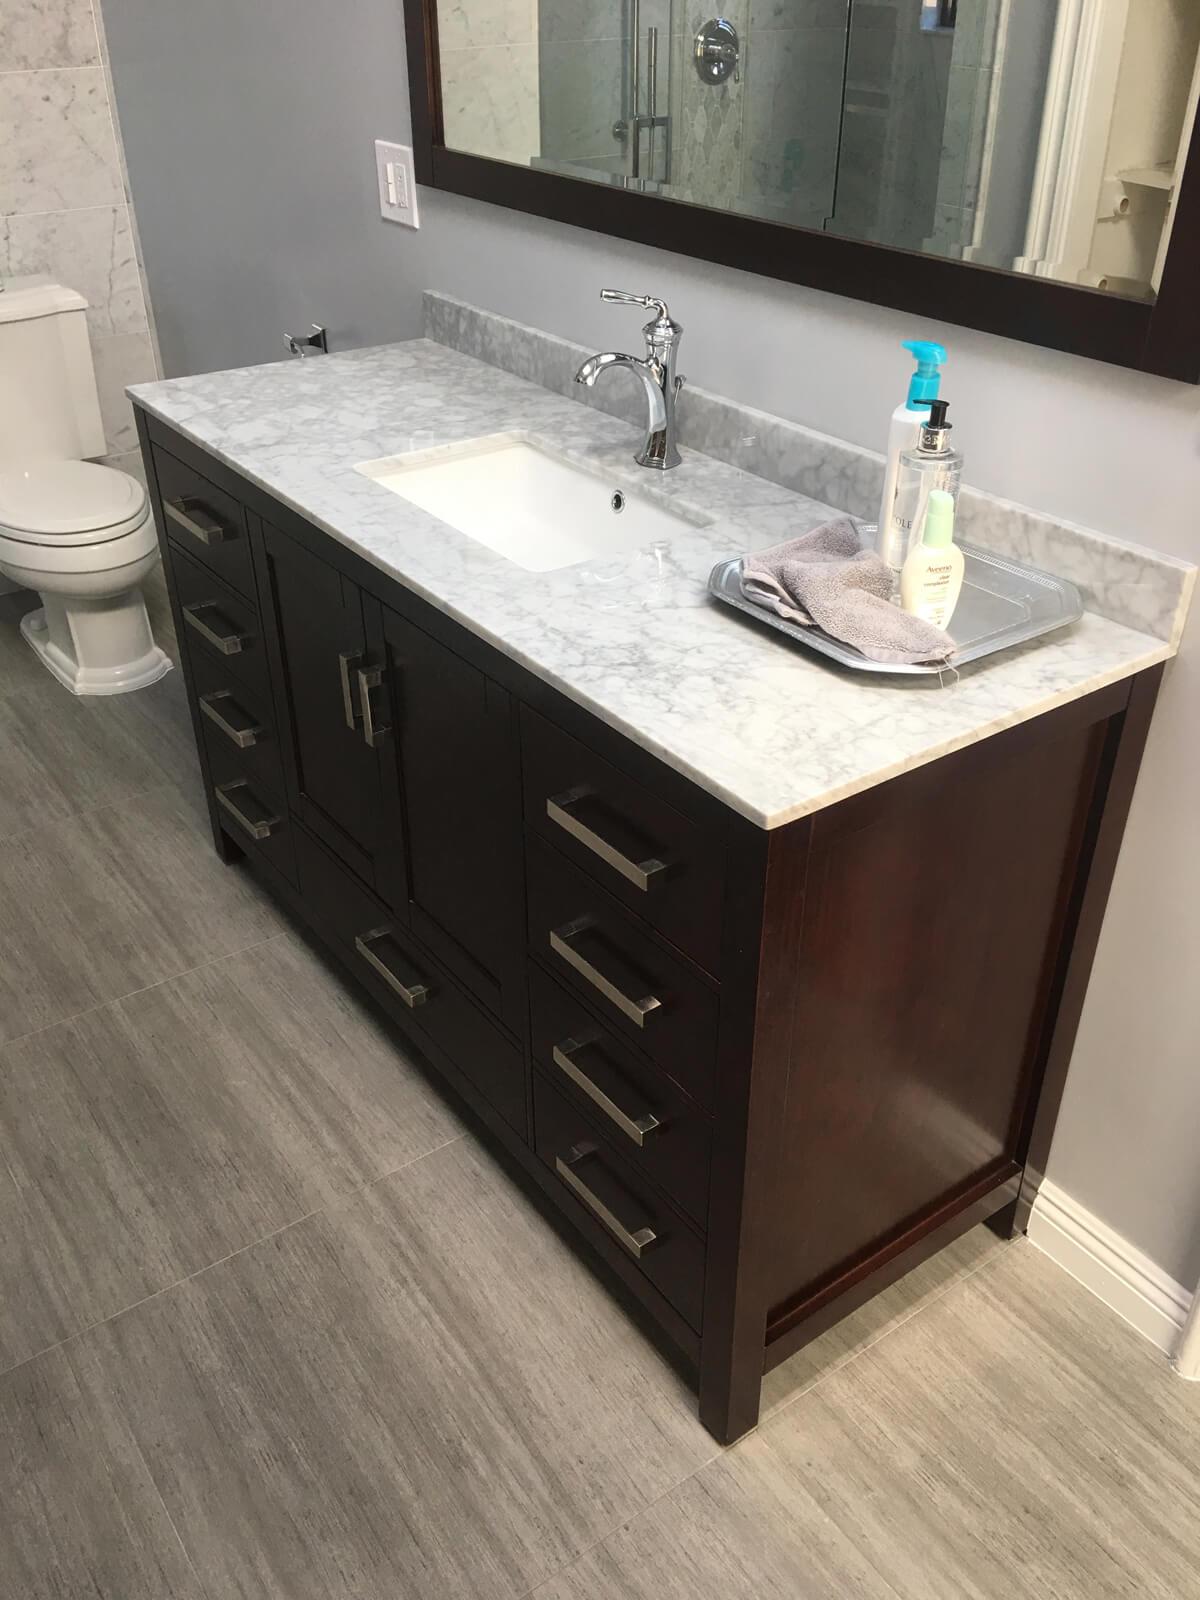 19 - Laraine Project - Los Angeles - Bathroom Remodel Reconfiguration